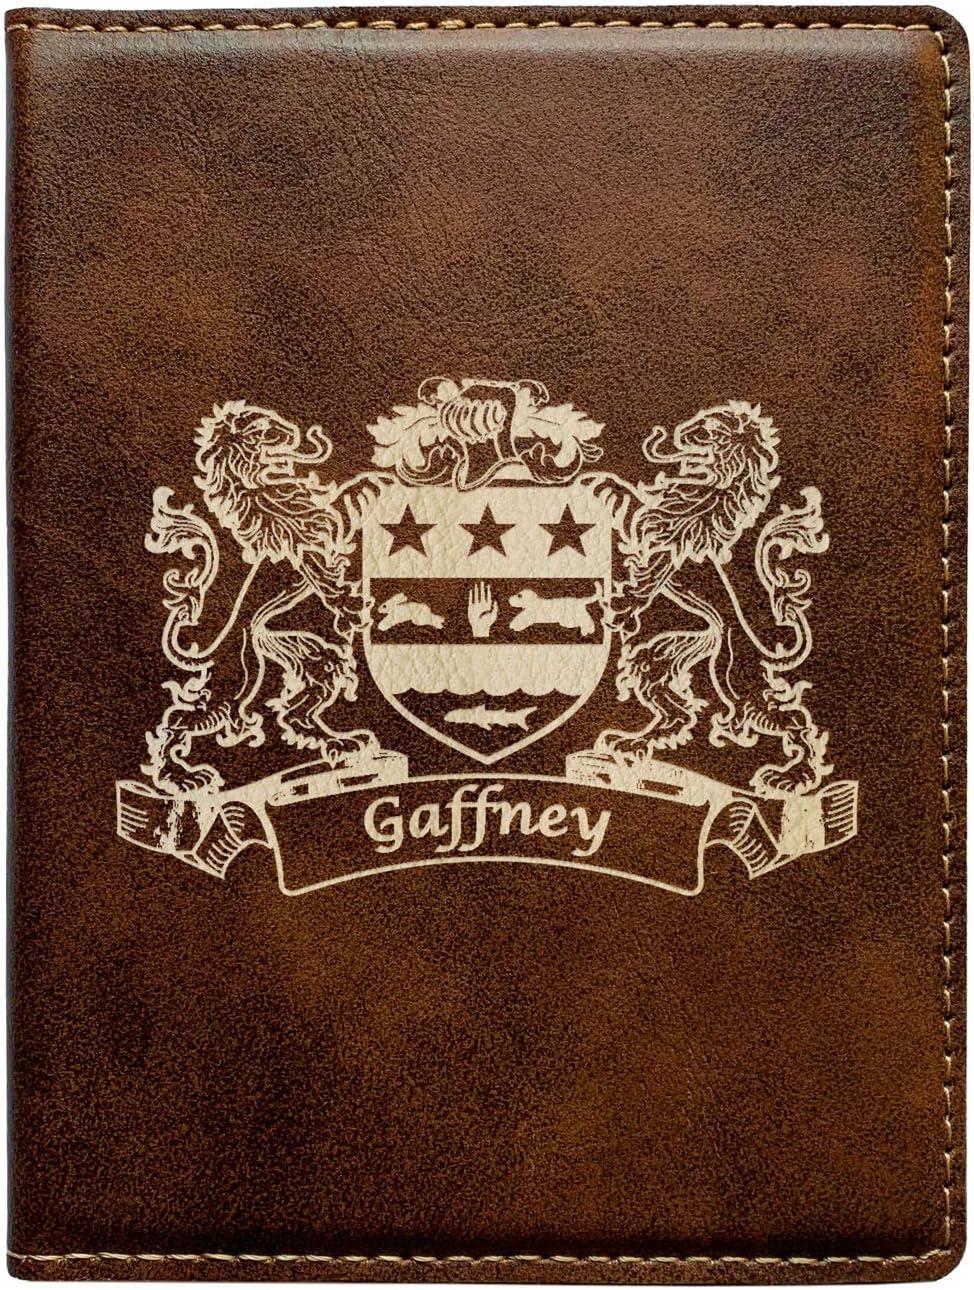 Gaffney Irish Coat of Arms Leather Passport Wallet